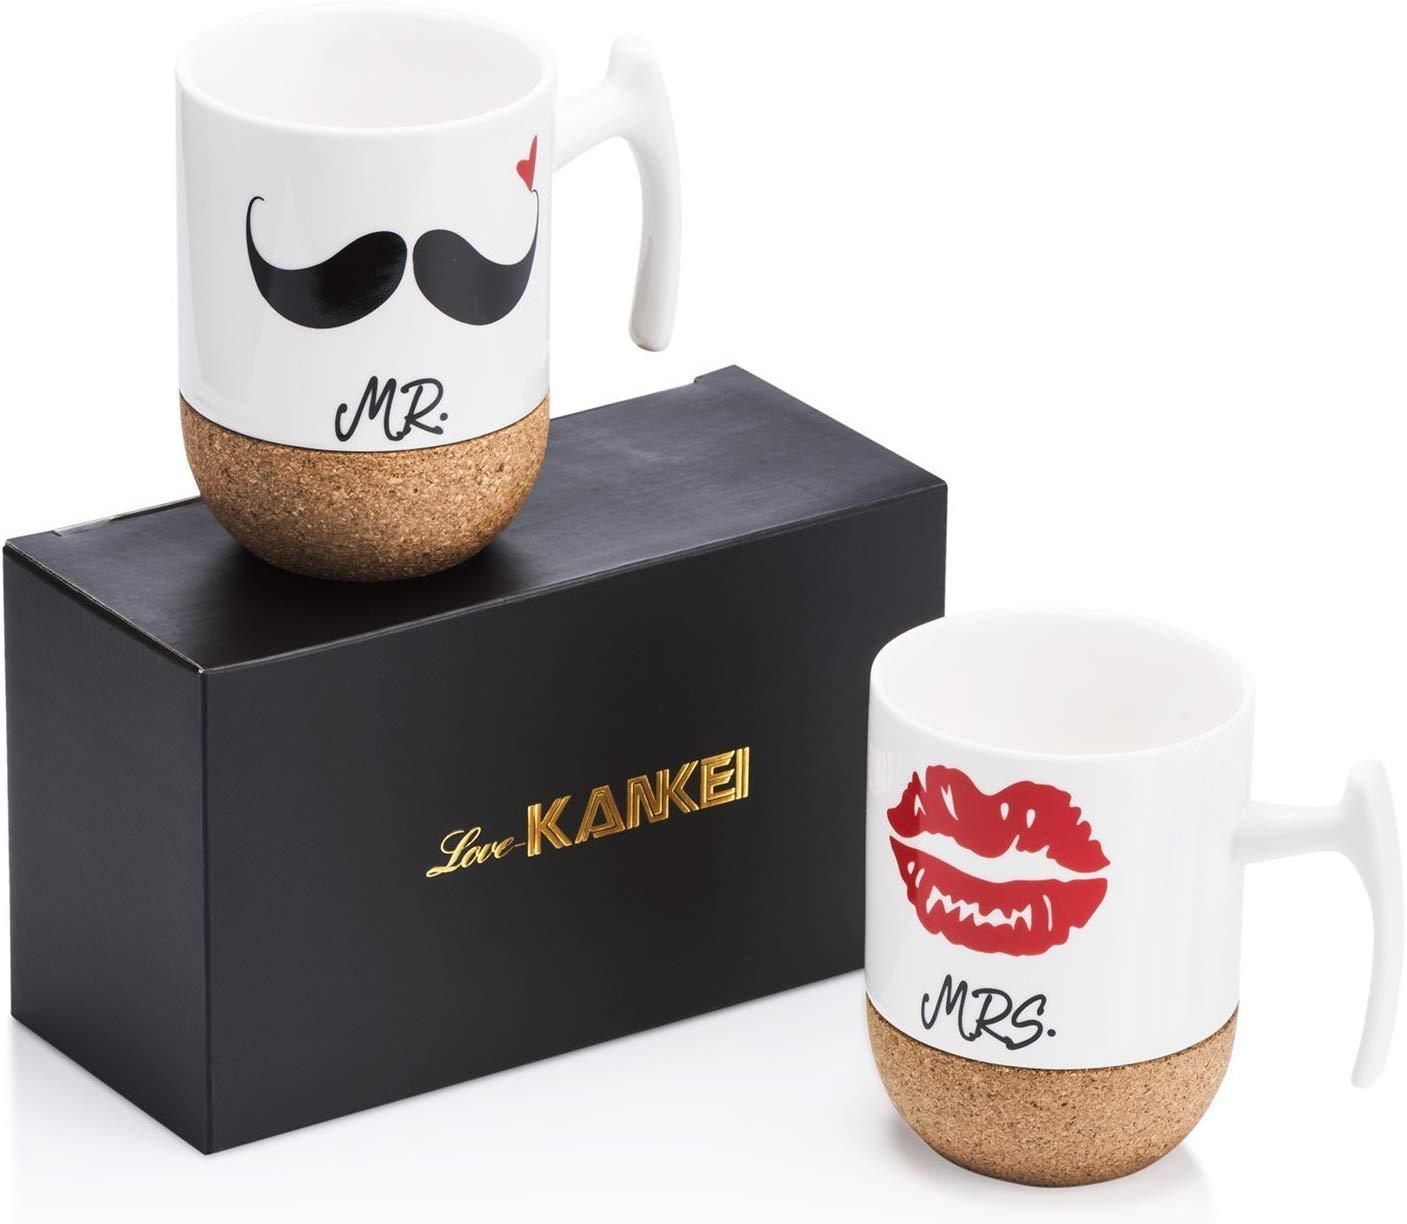 Mr and Mrs Ceramic Mugs - unique 25th anniversary gift ideas